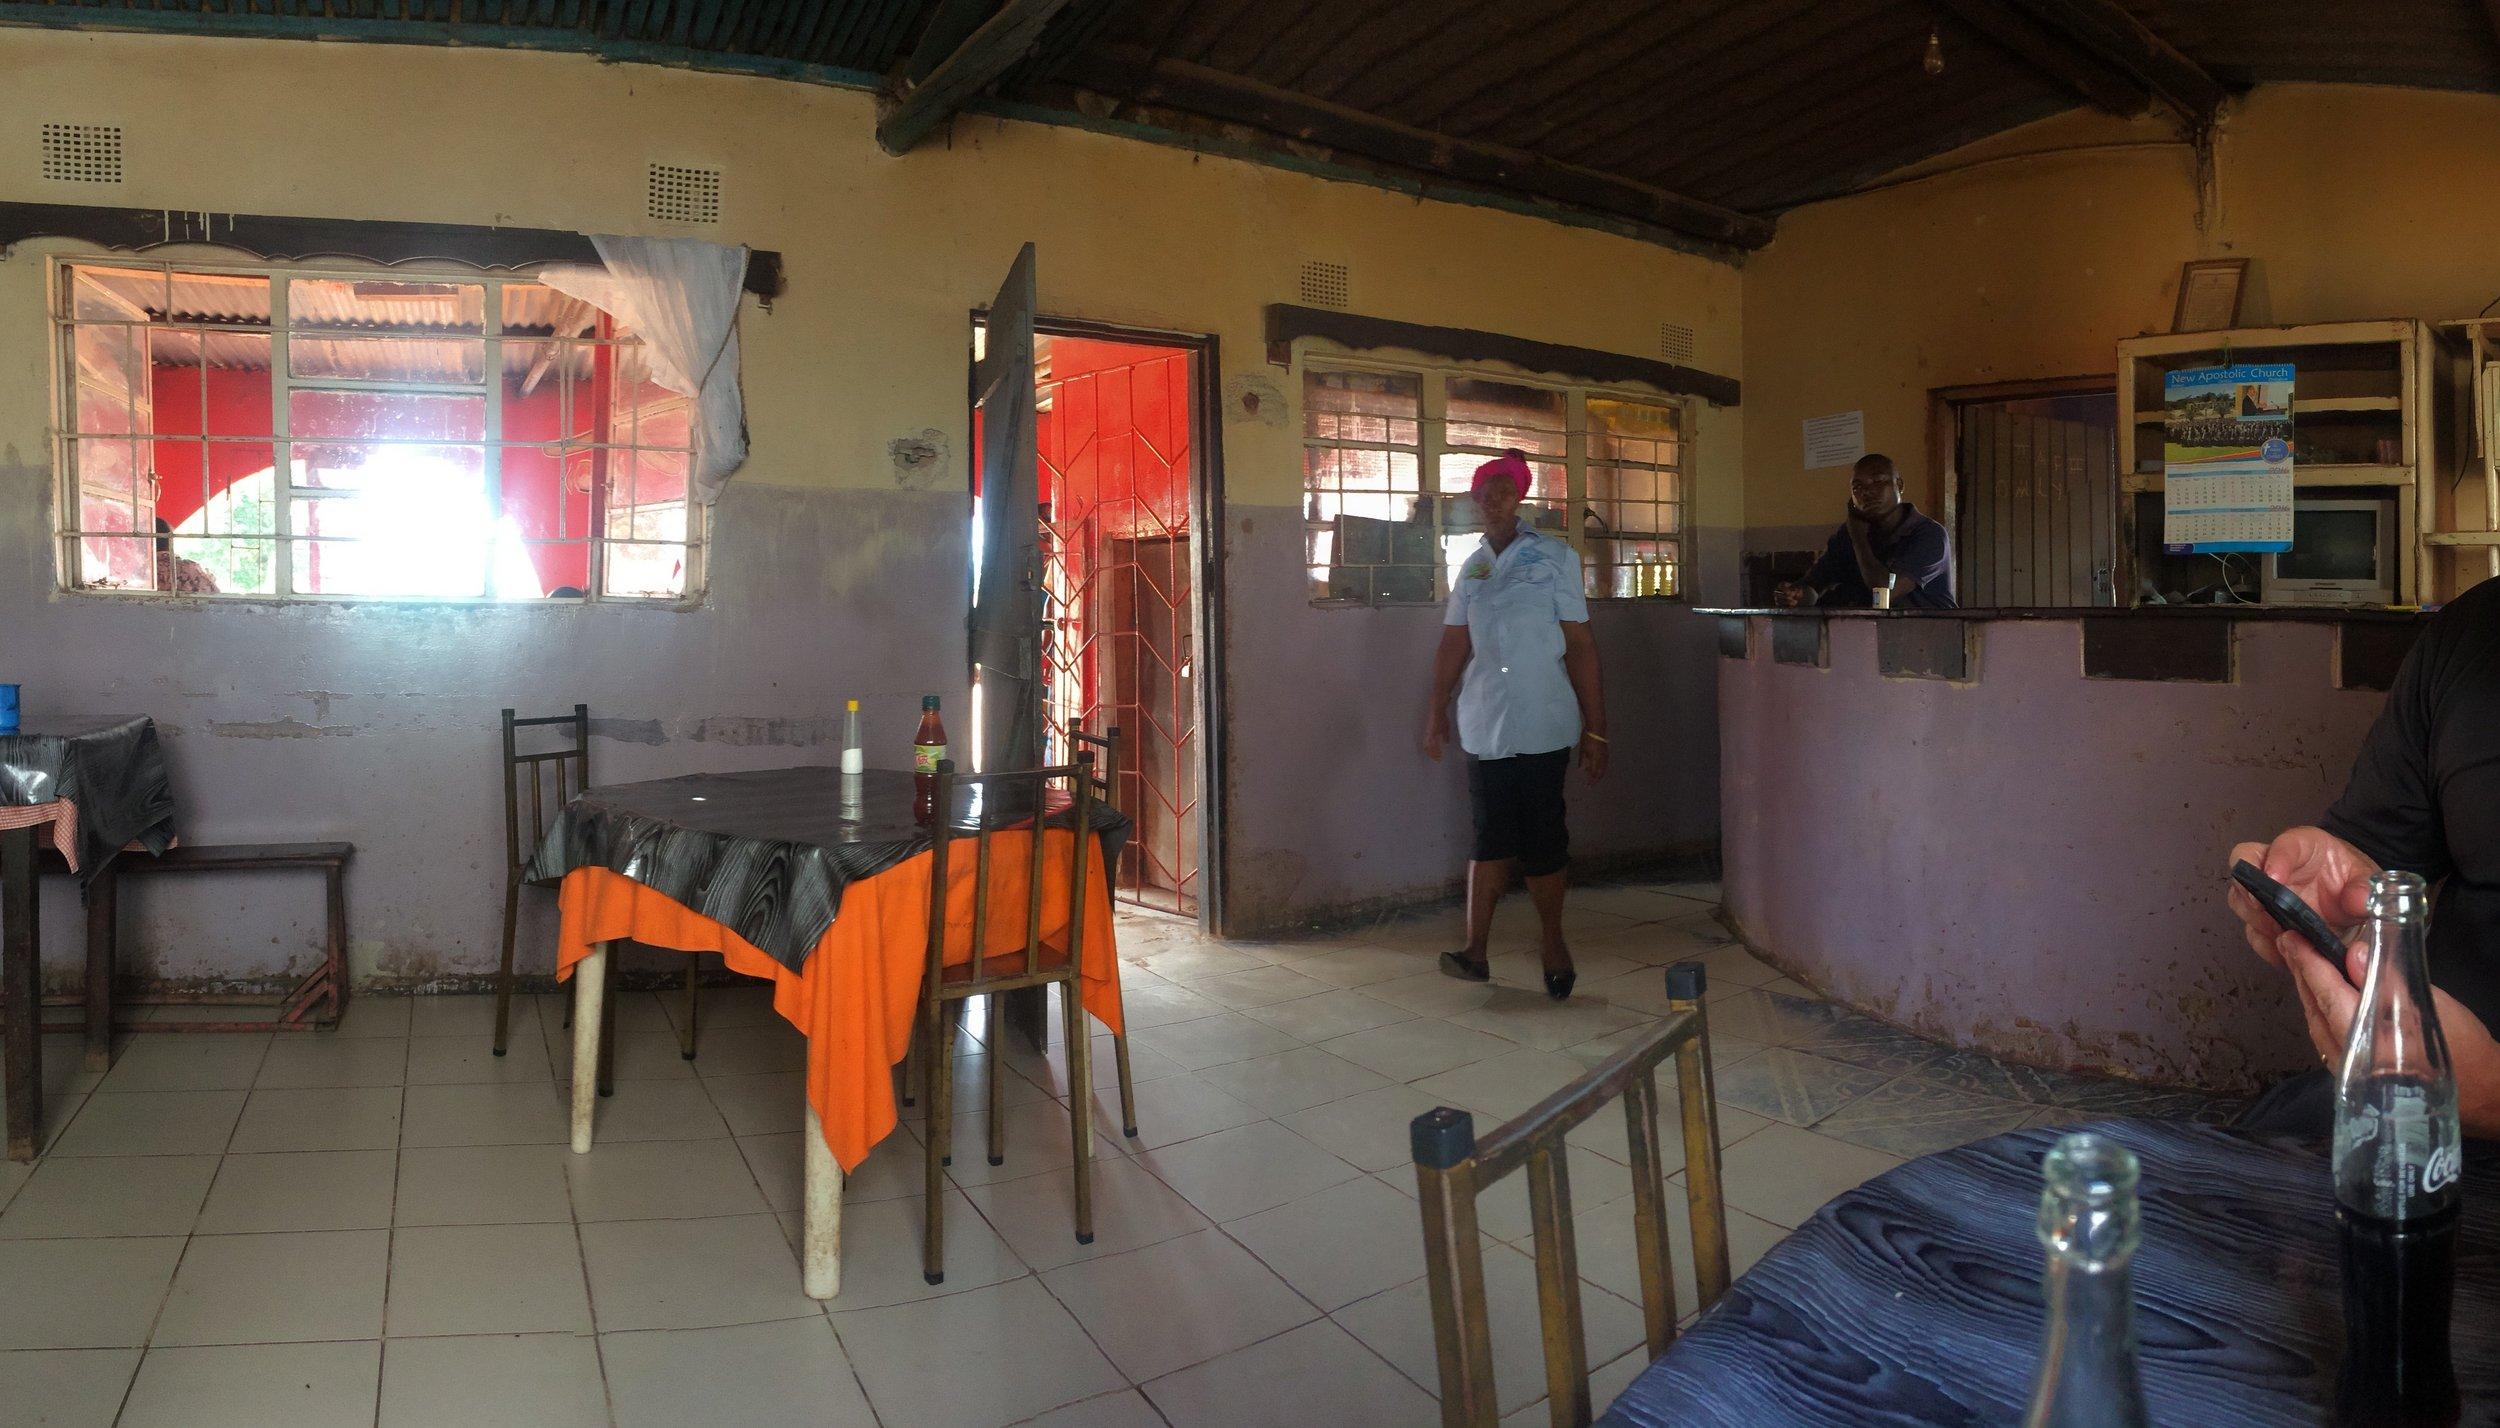 Roadside cafe for 50c lunch.